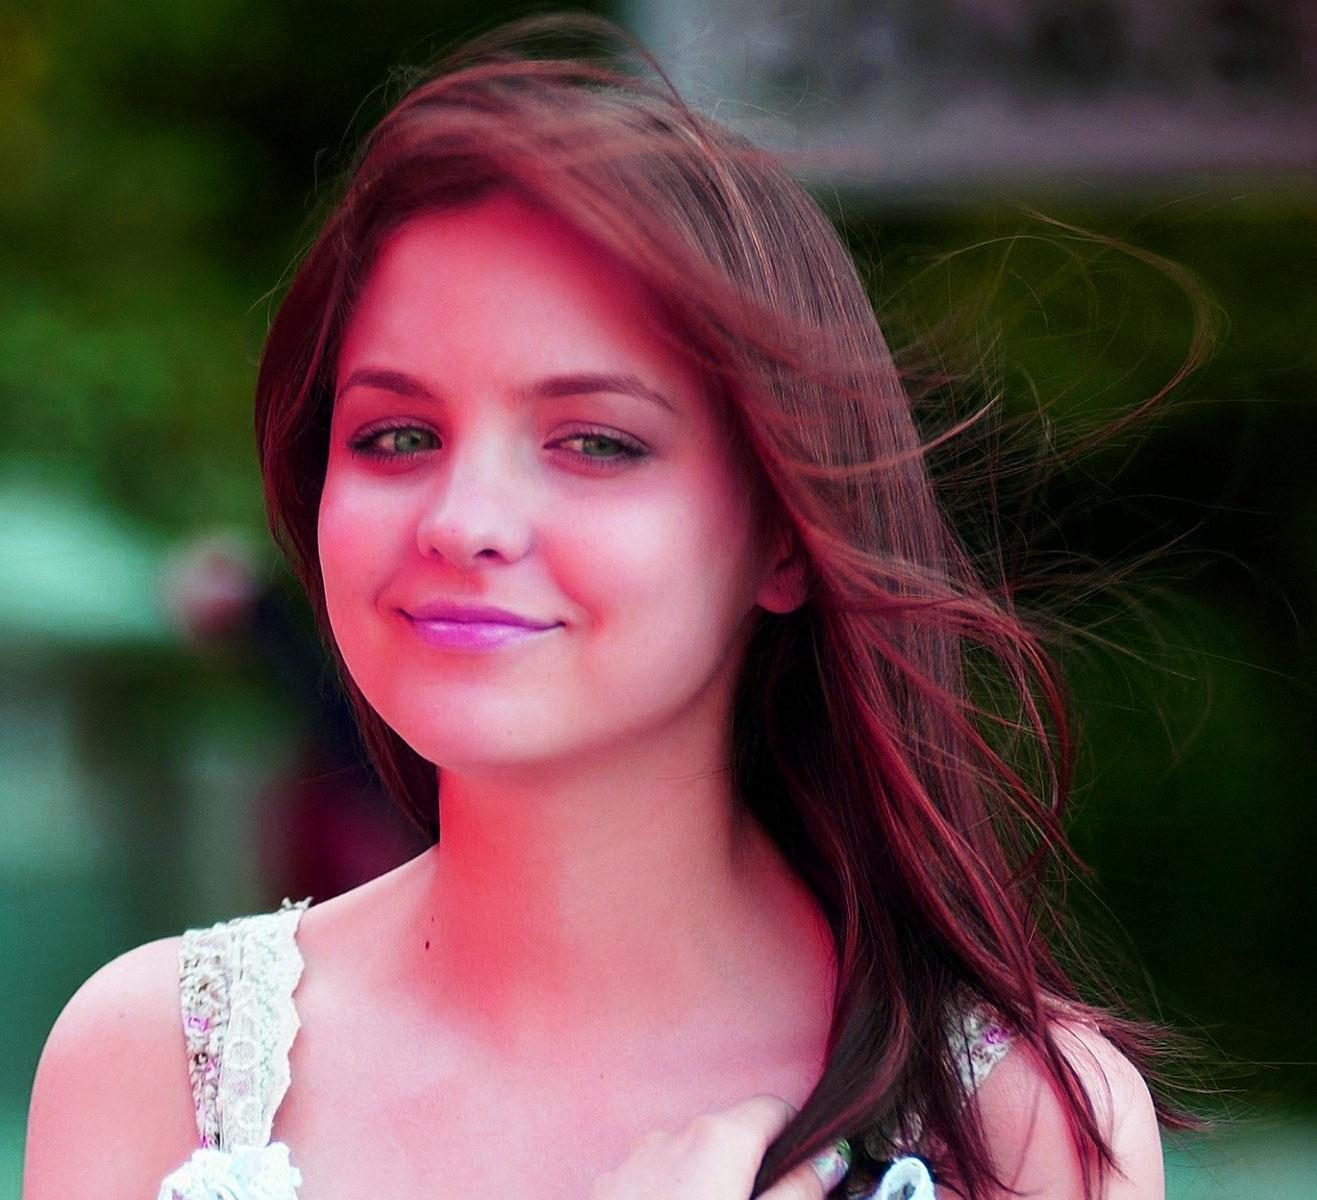 Super Beautiful Girls Images Pics